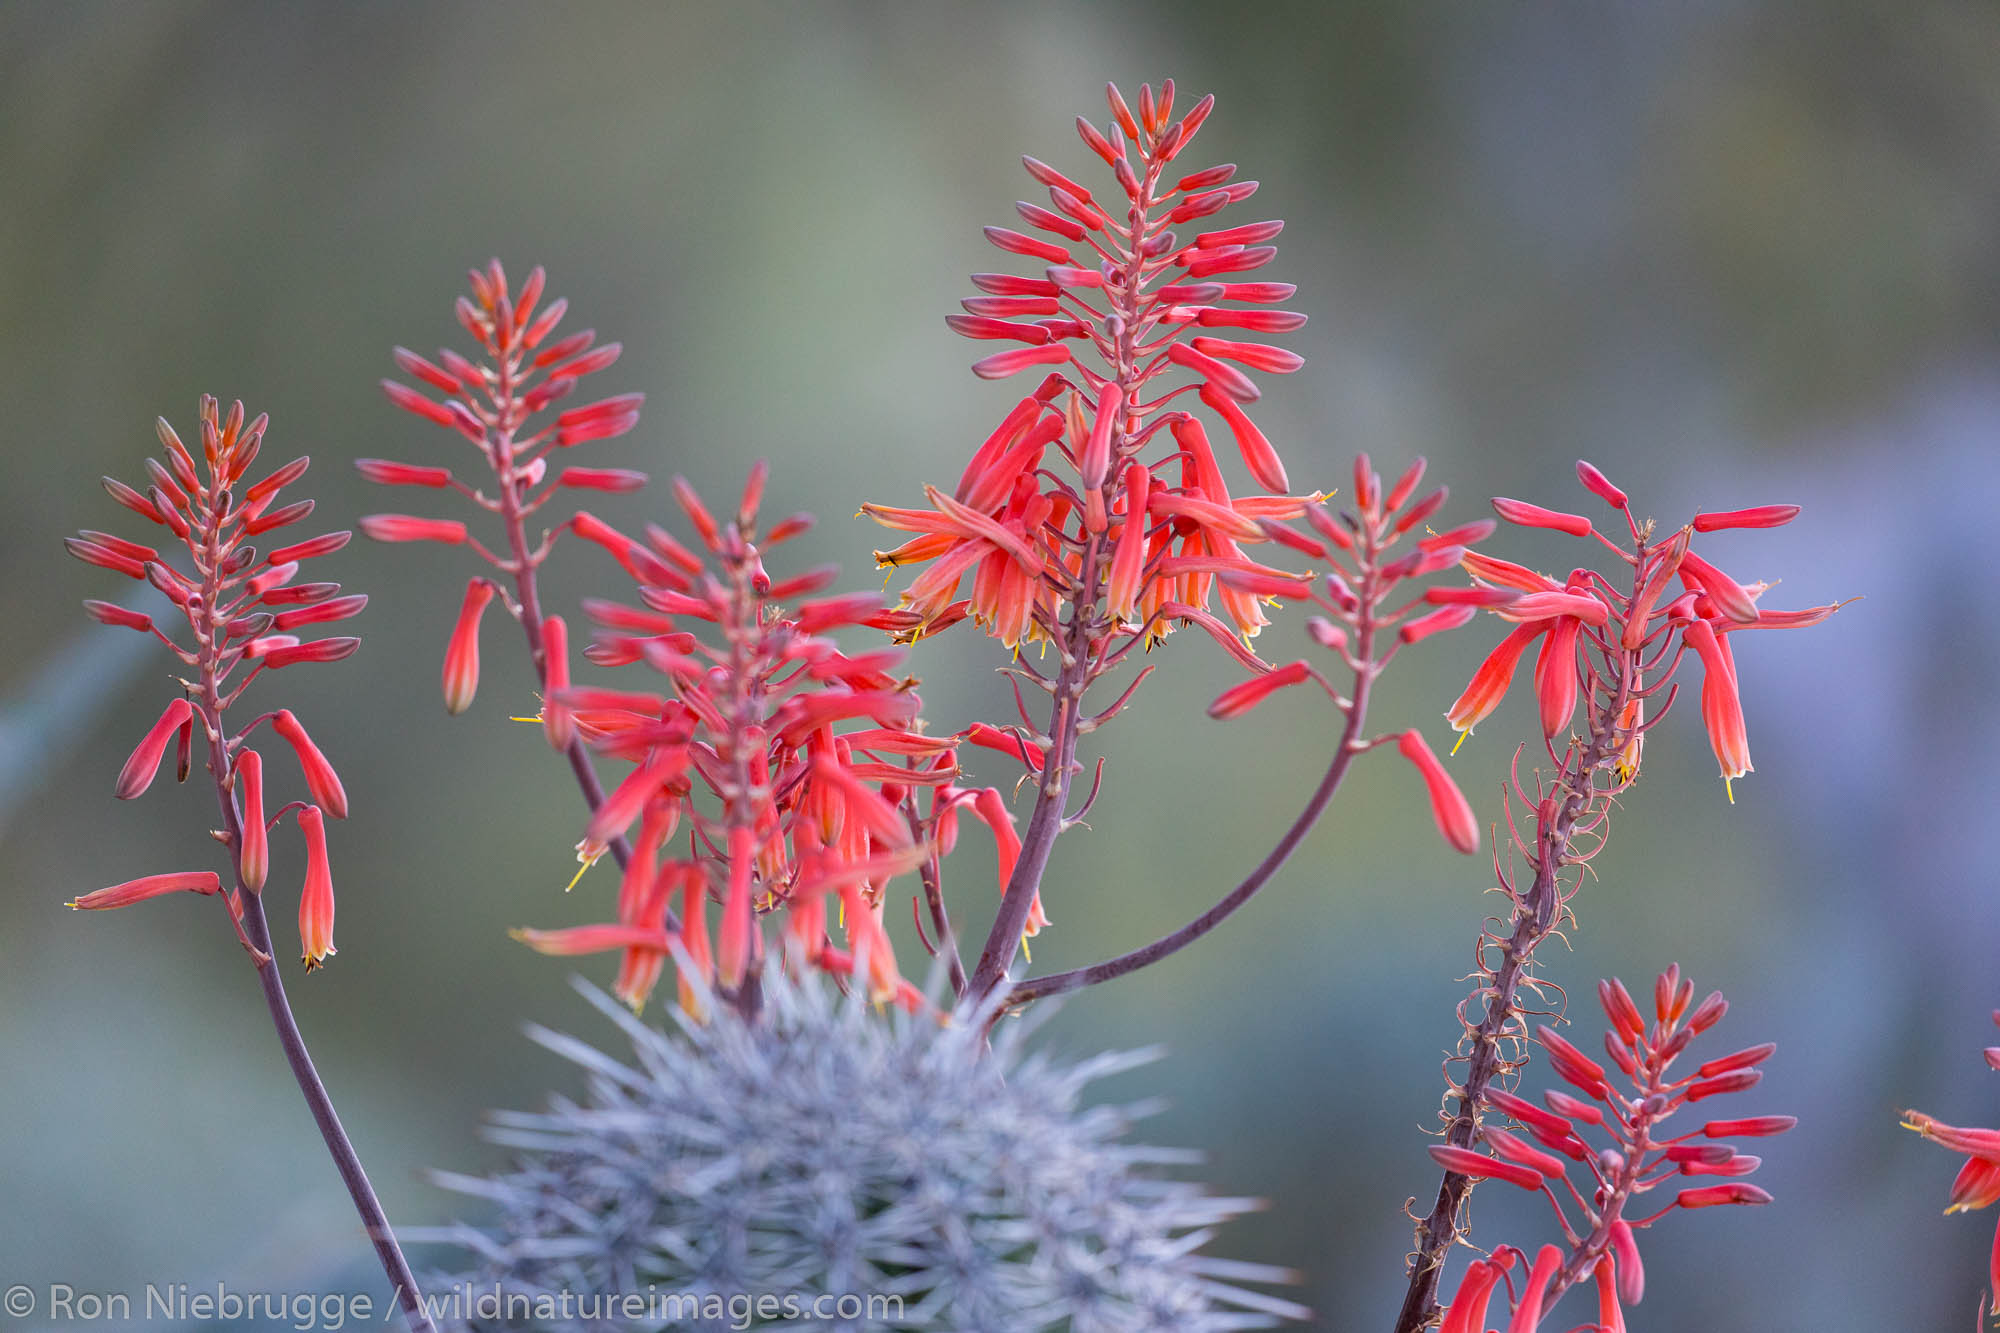 Flowering Aloe Vera, Arizona.